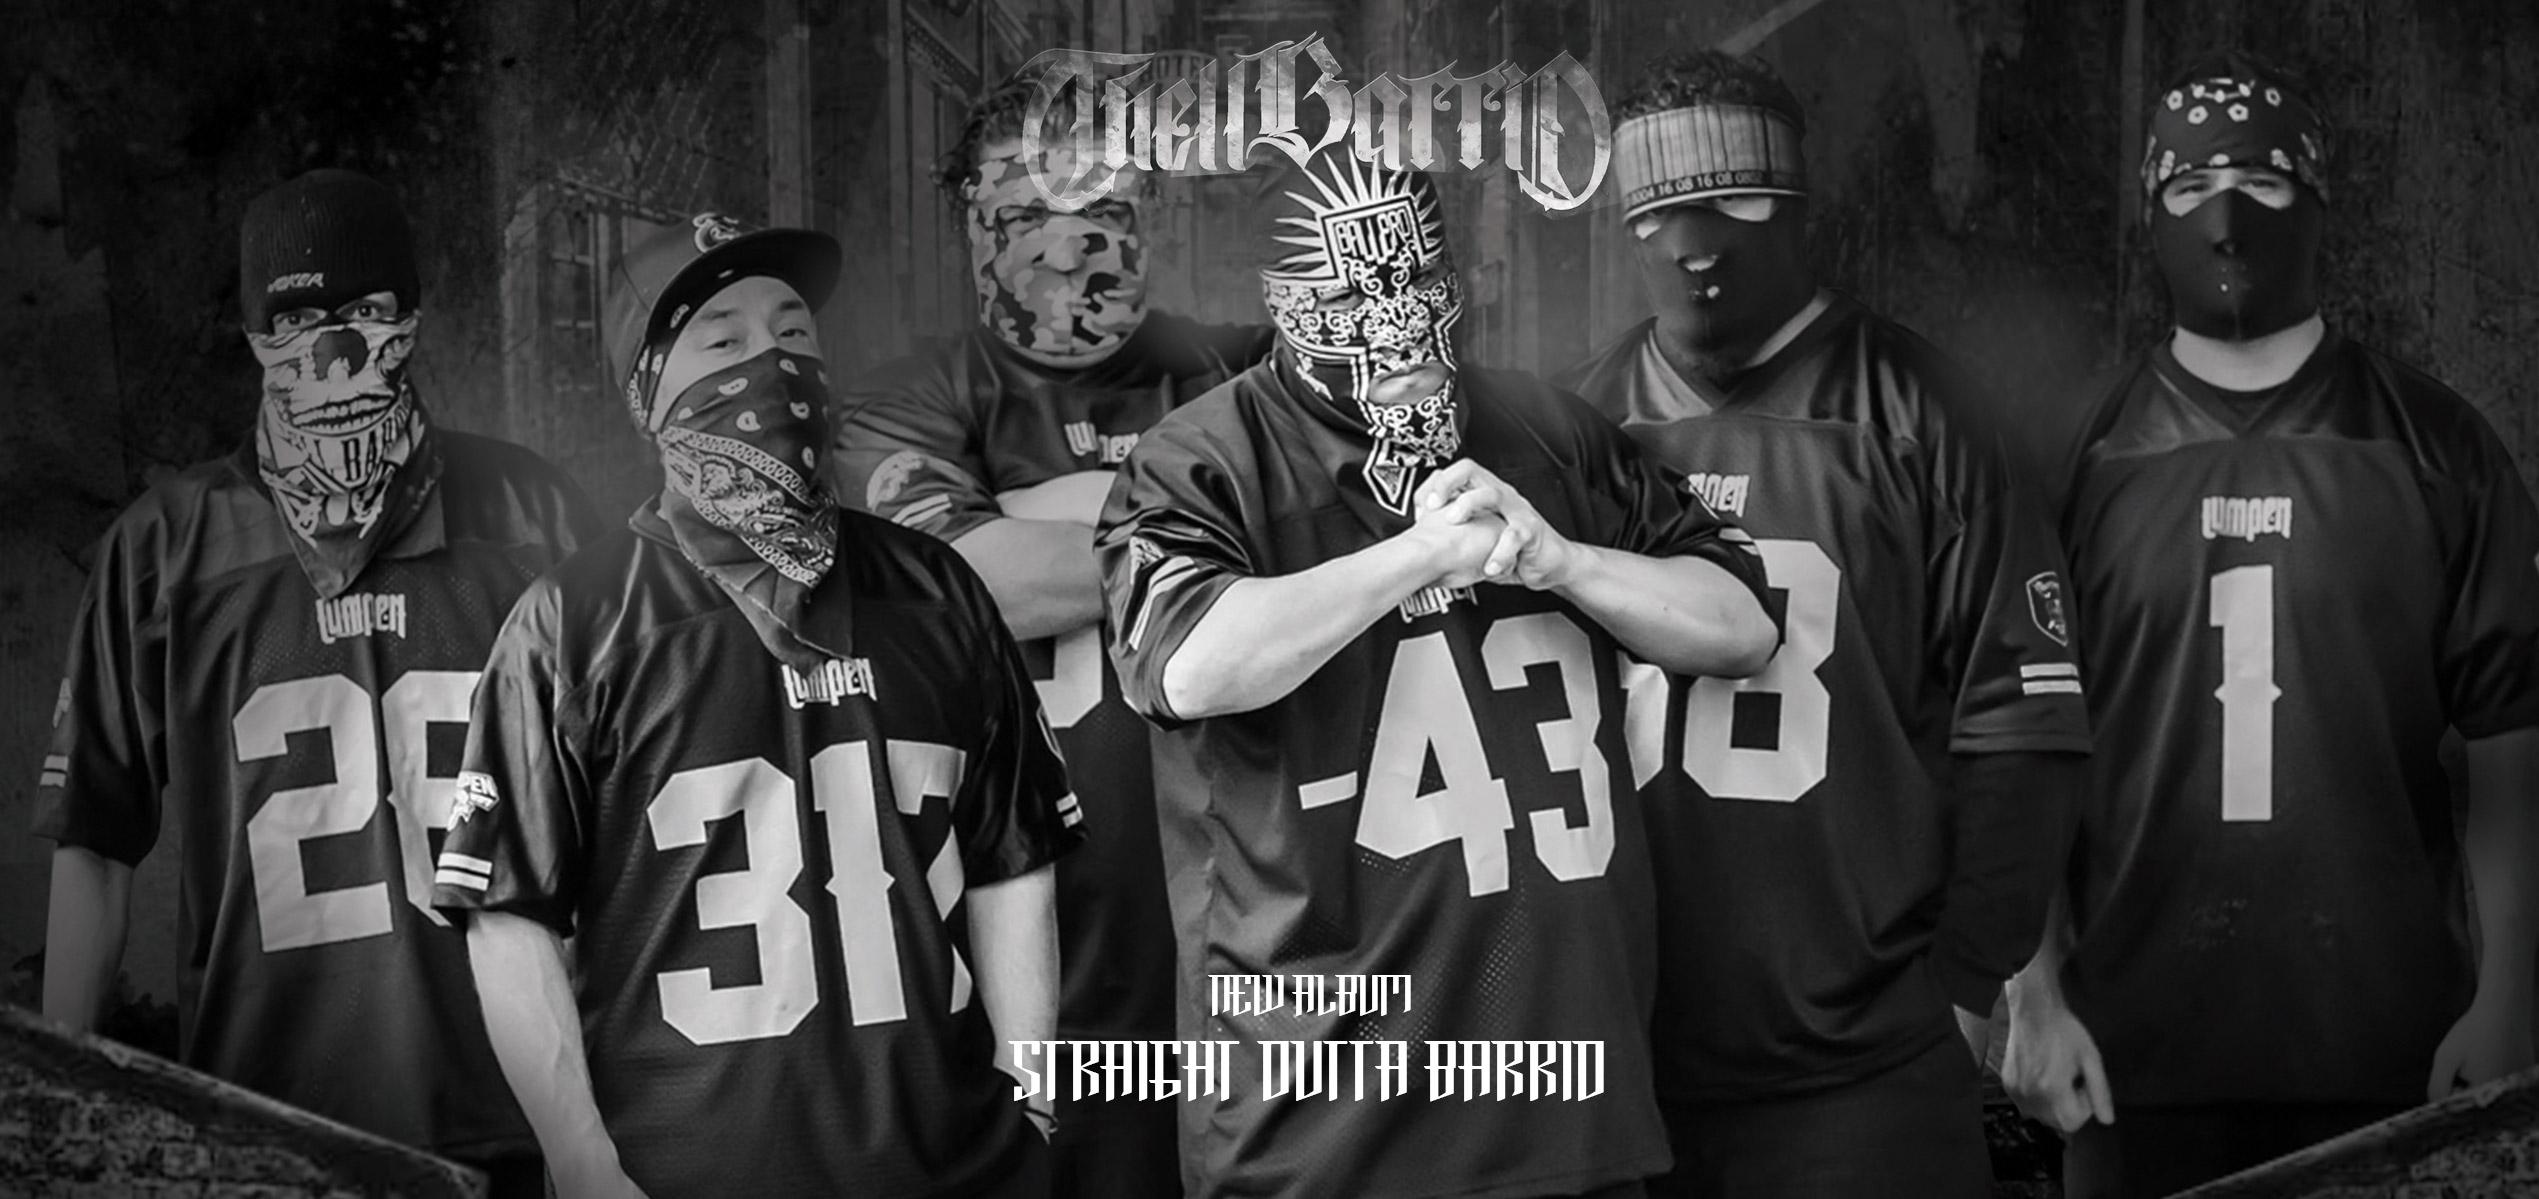 thellbarrio-new-album-straight-outta-barrio